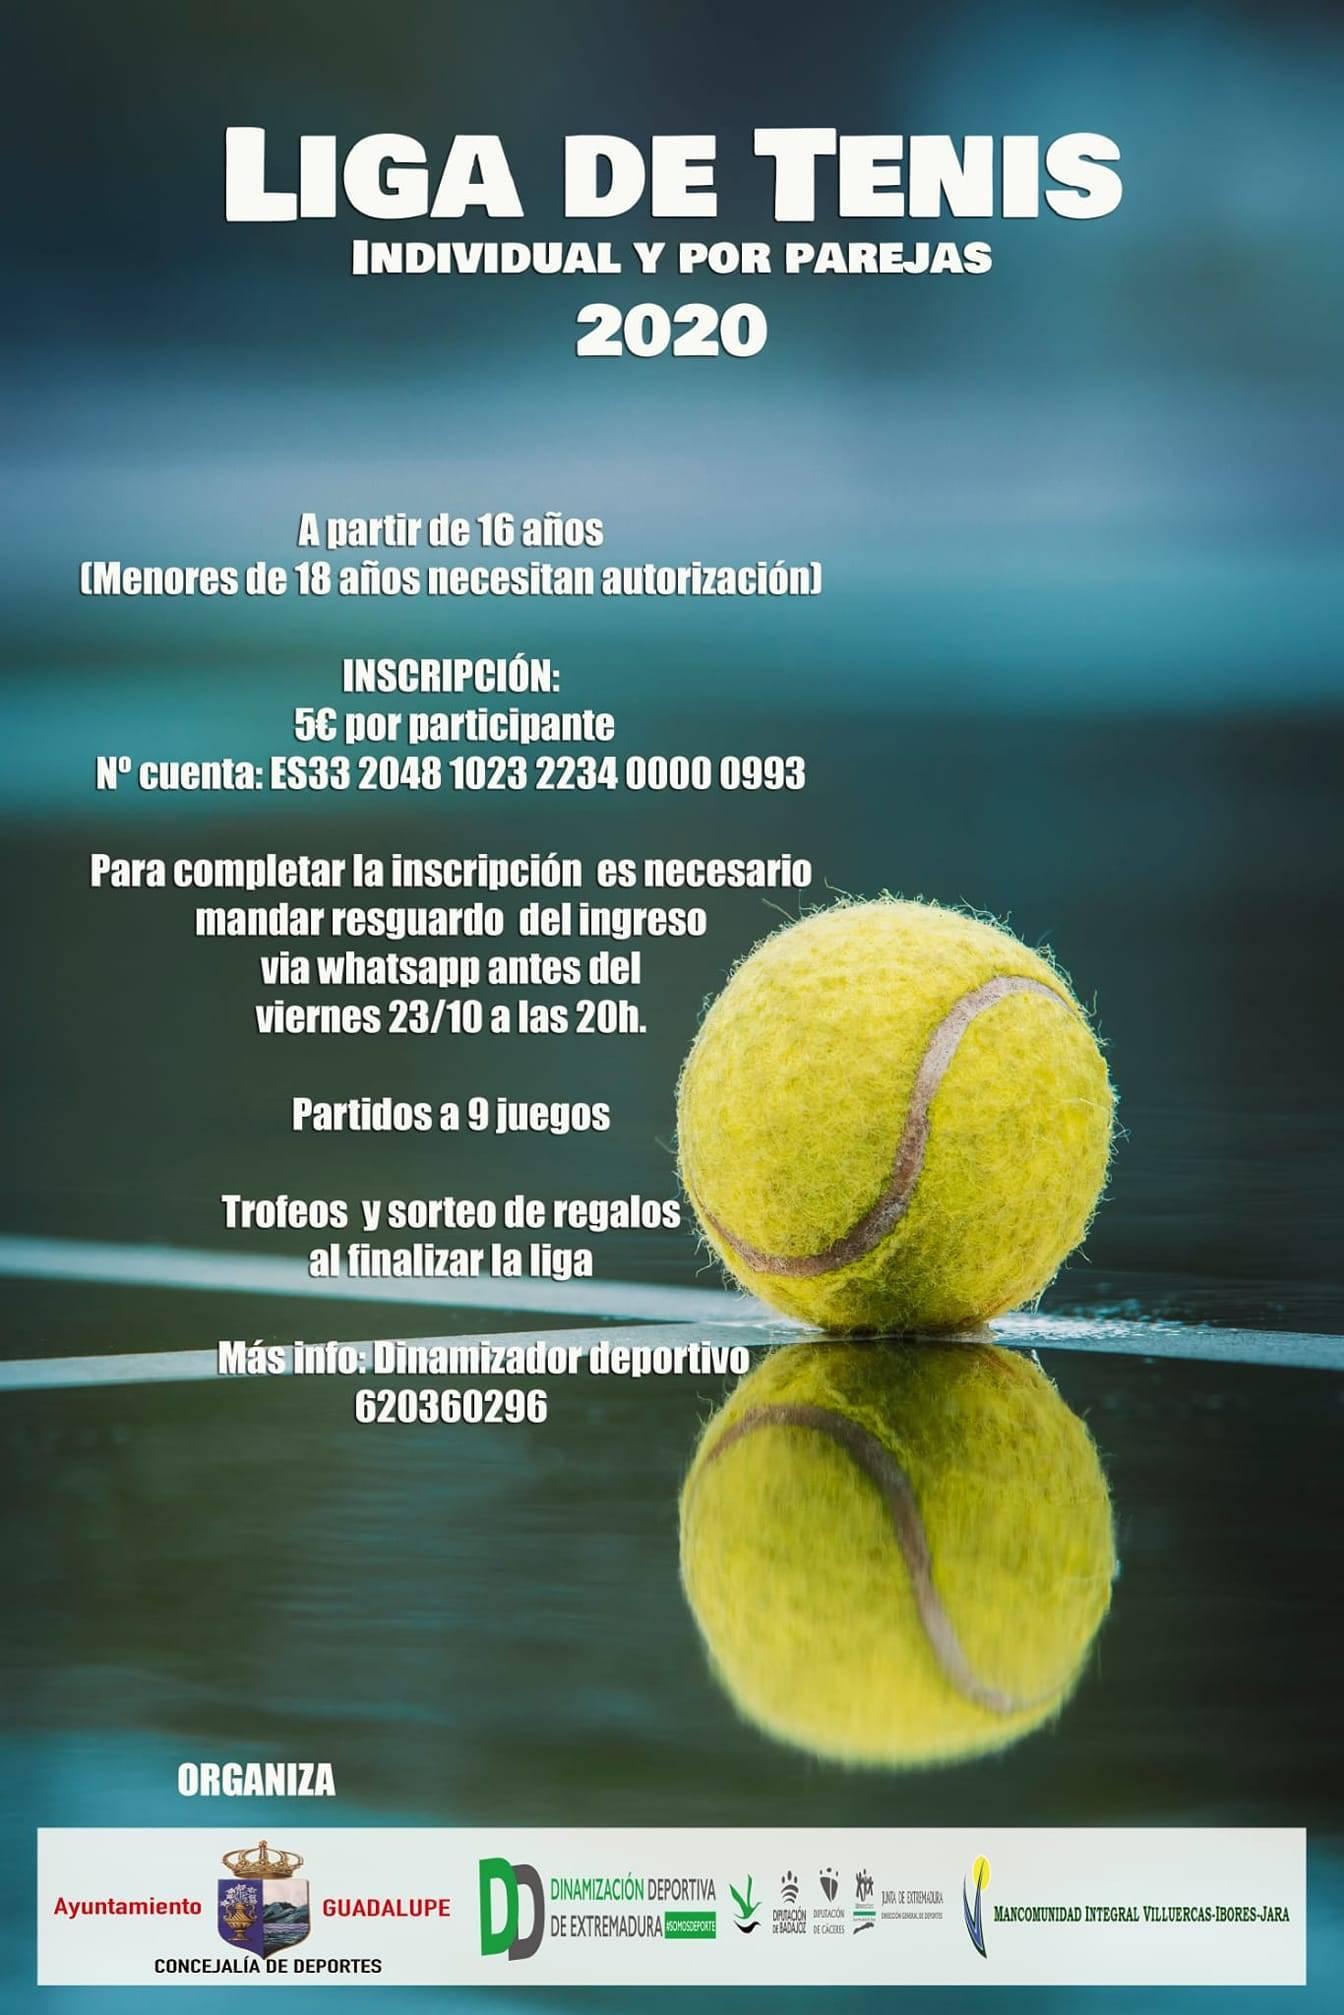 Liga de tenis (2020) - Guadalupe (Cáceres)